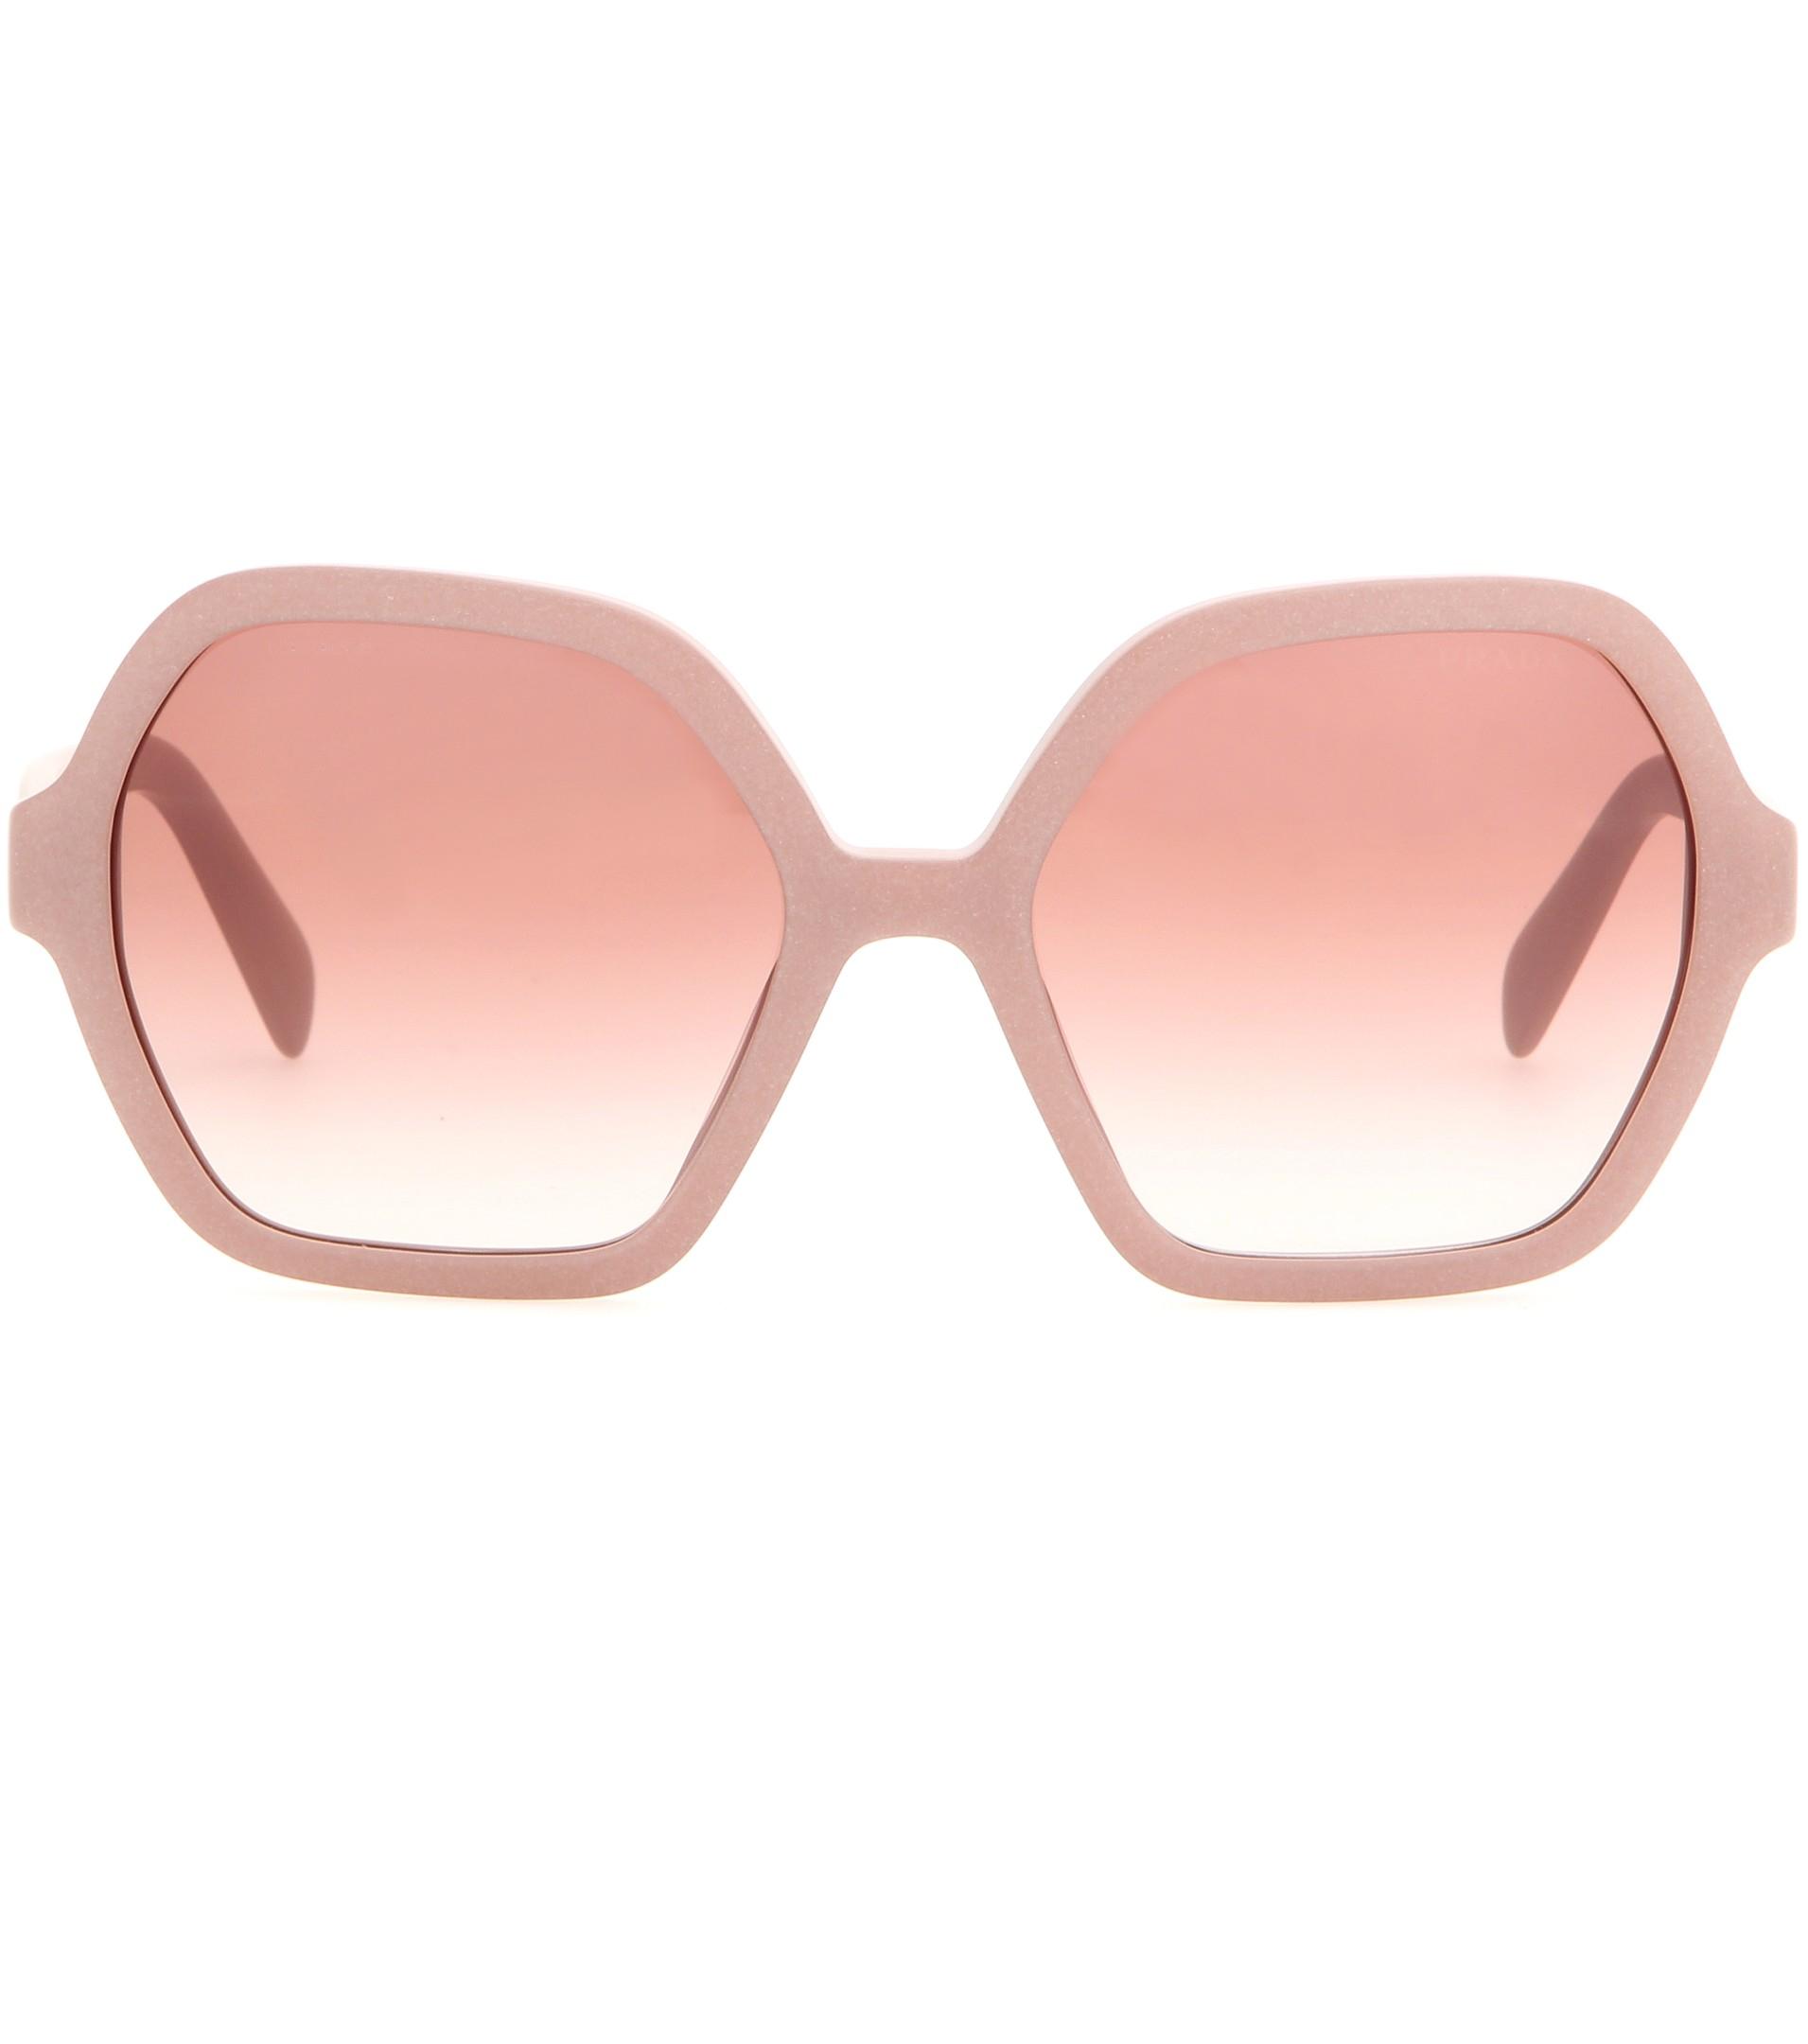 7a0936d0671 hot prada 21us womens cats eye sunglasses 3c39f b6899  best lyst prada  sunglasses in pink de258 b1a6a